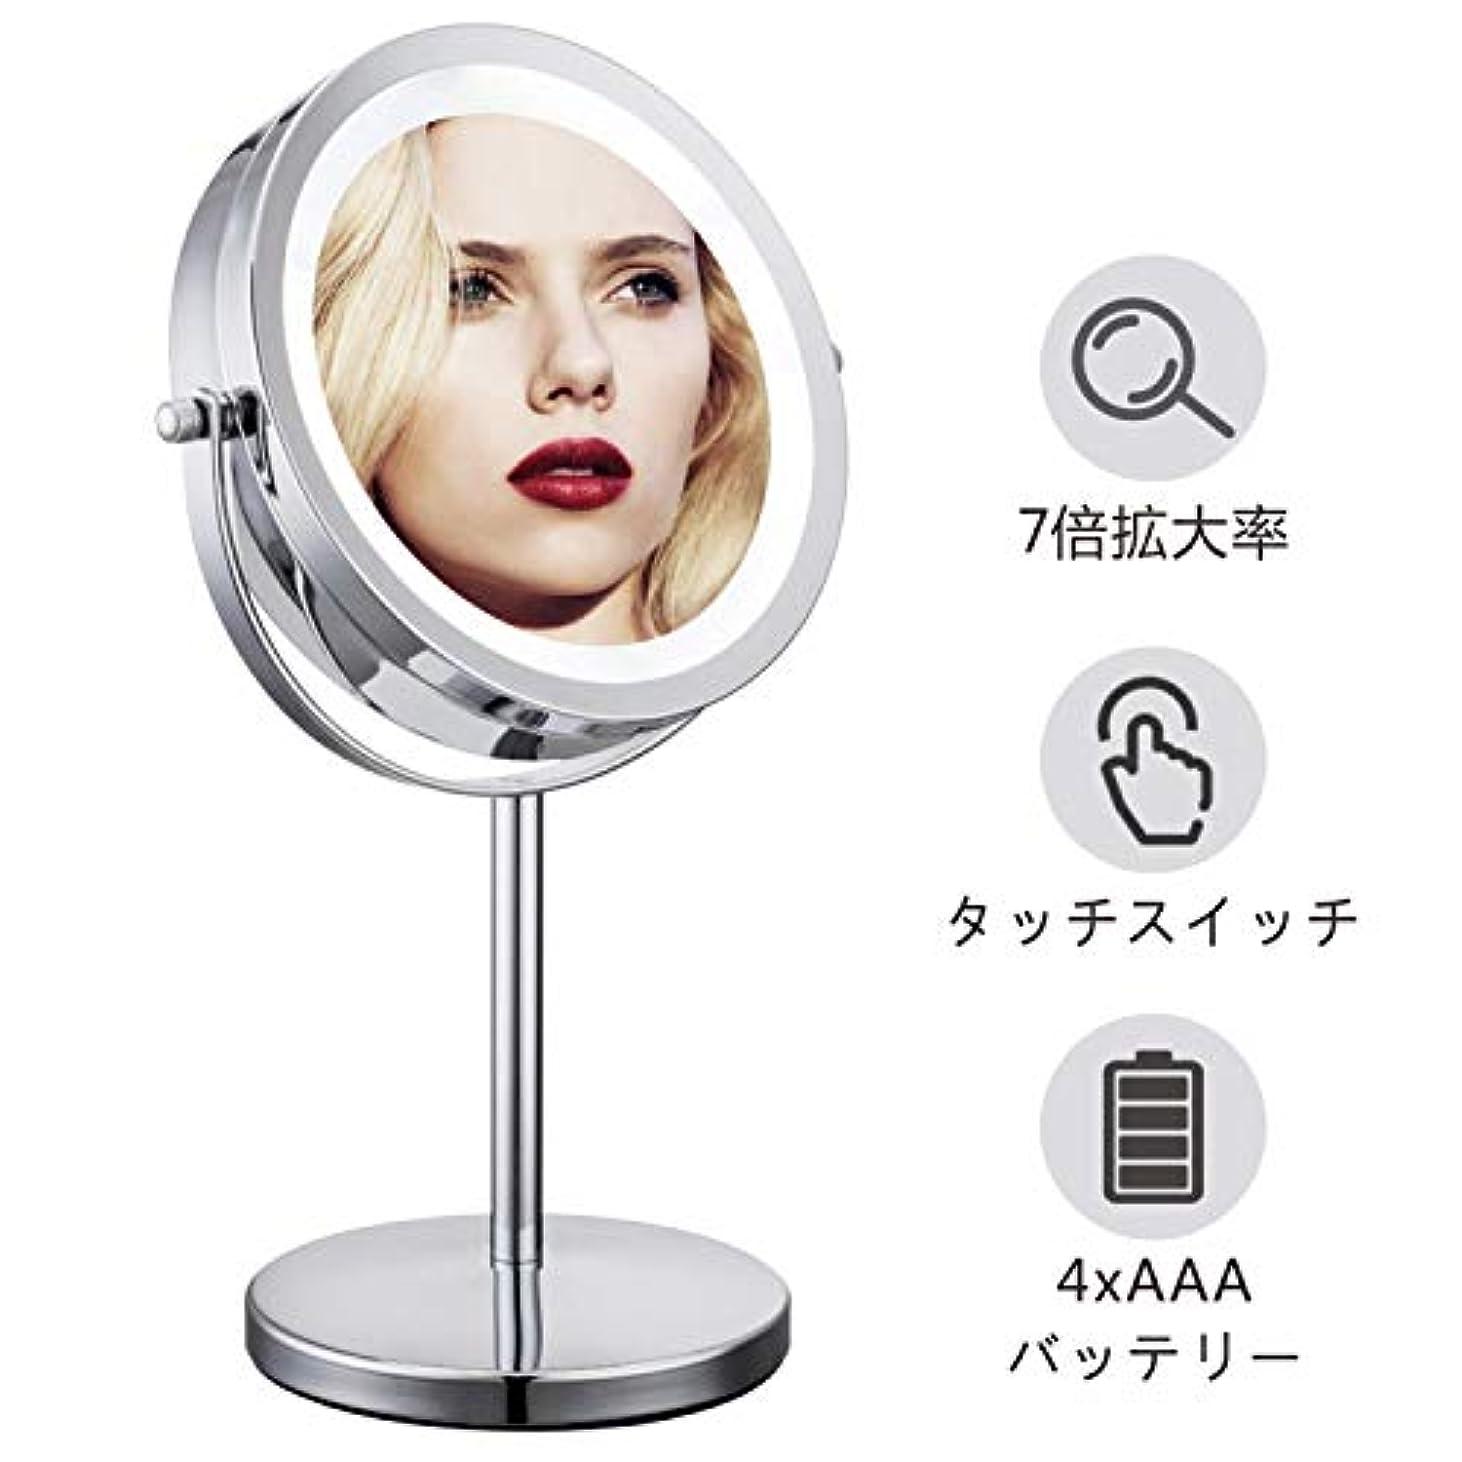 流星一定安価なMinracler 化粧鏡 7倍拡大 卓上 化粧ミラー led両面鏡 明るさ調節可能 360度回転 (鏡面155mmΦ) 電池給電